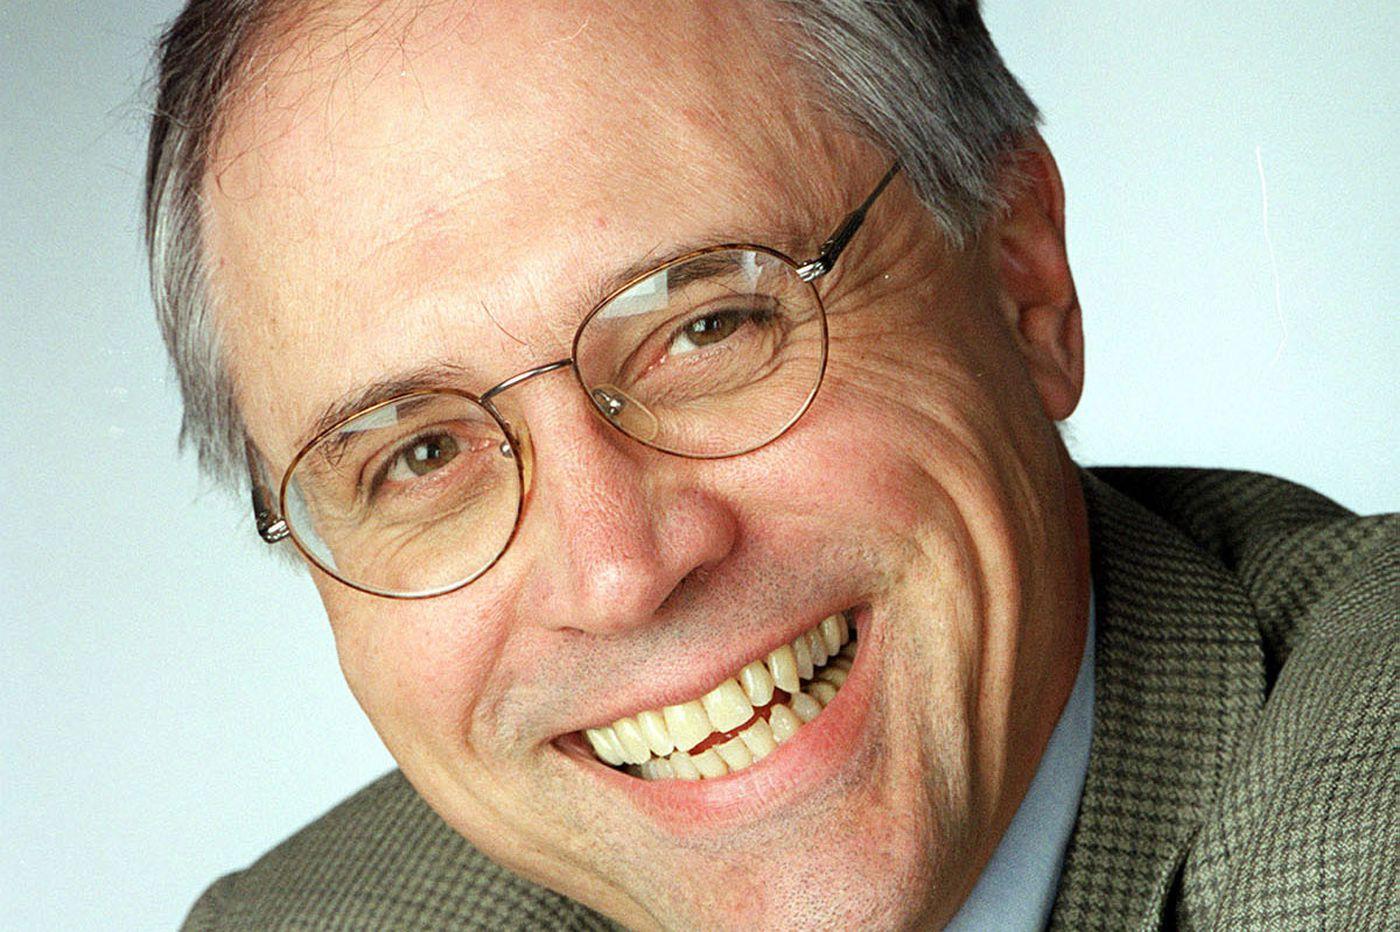 Gar Joseph, 71, legendary Daily News editor